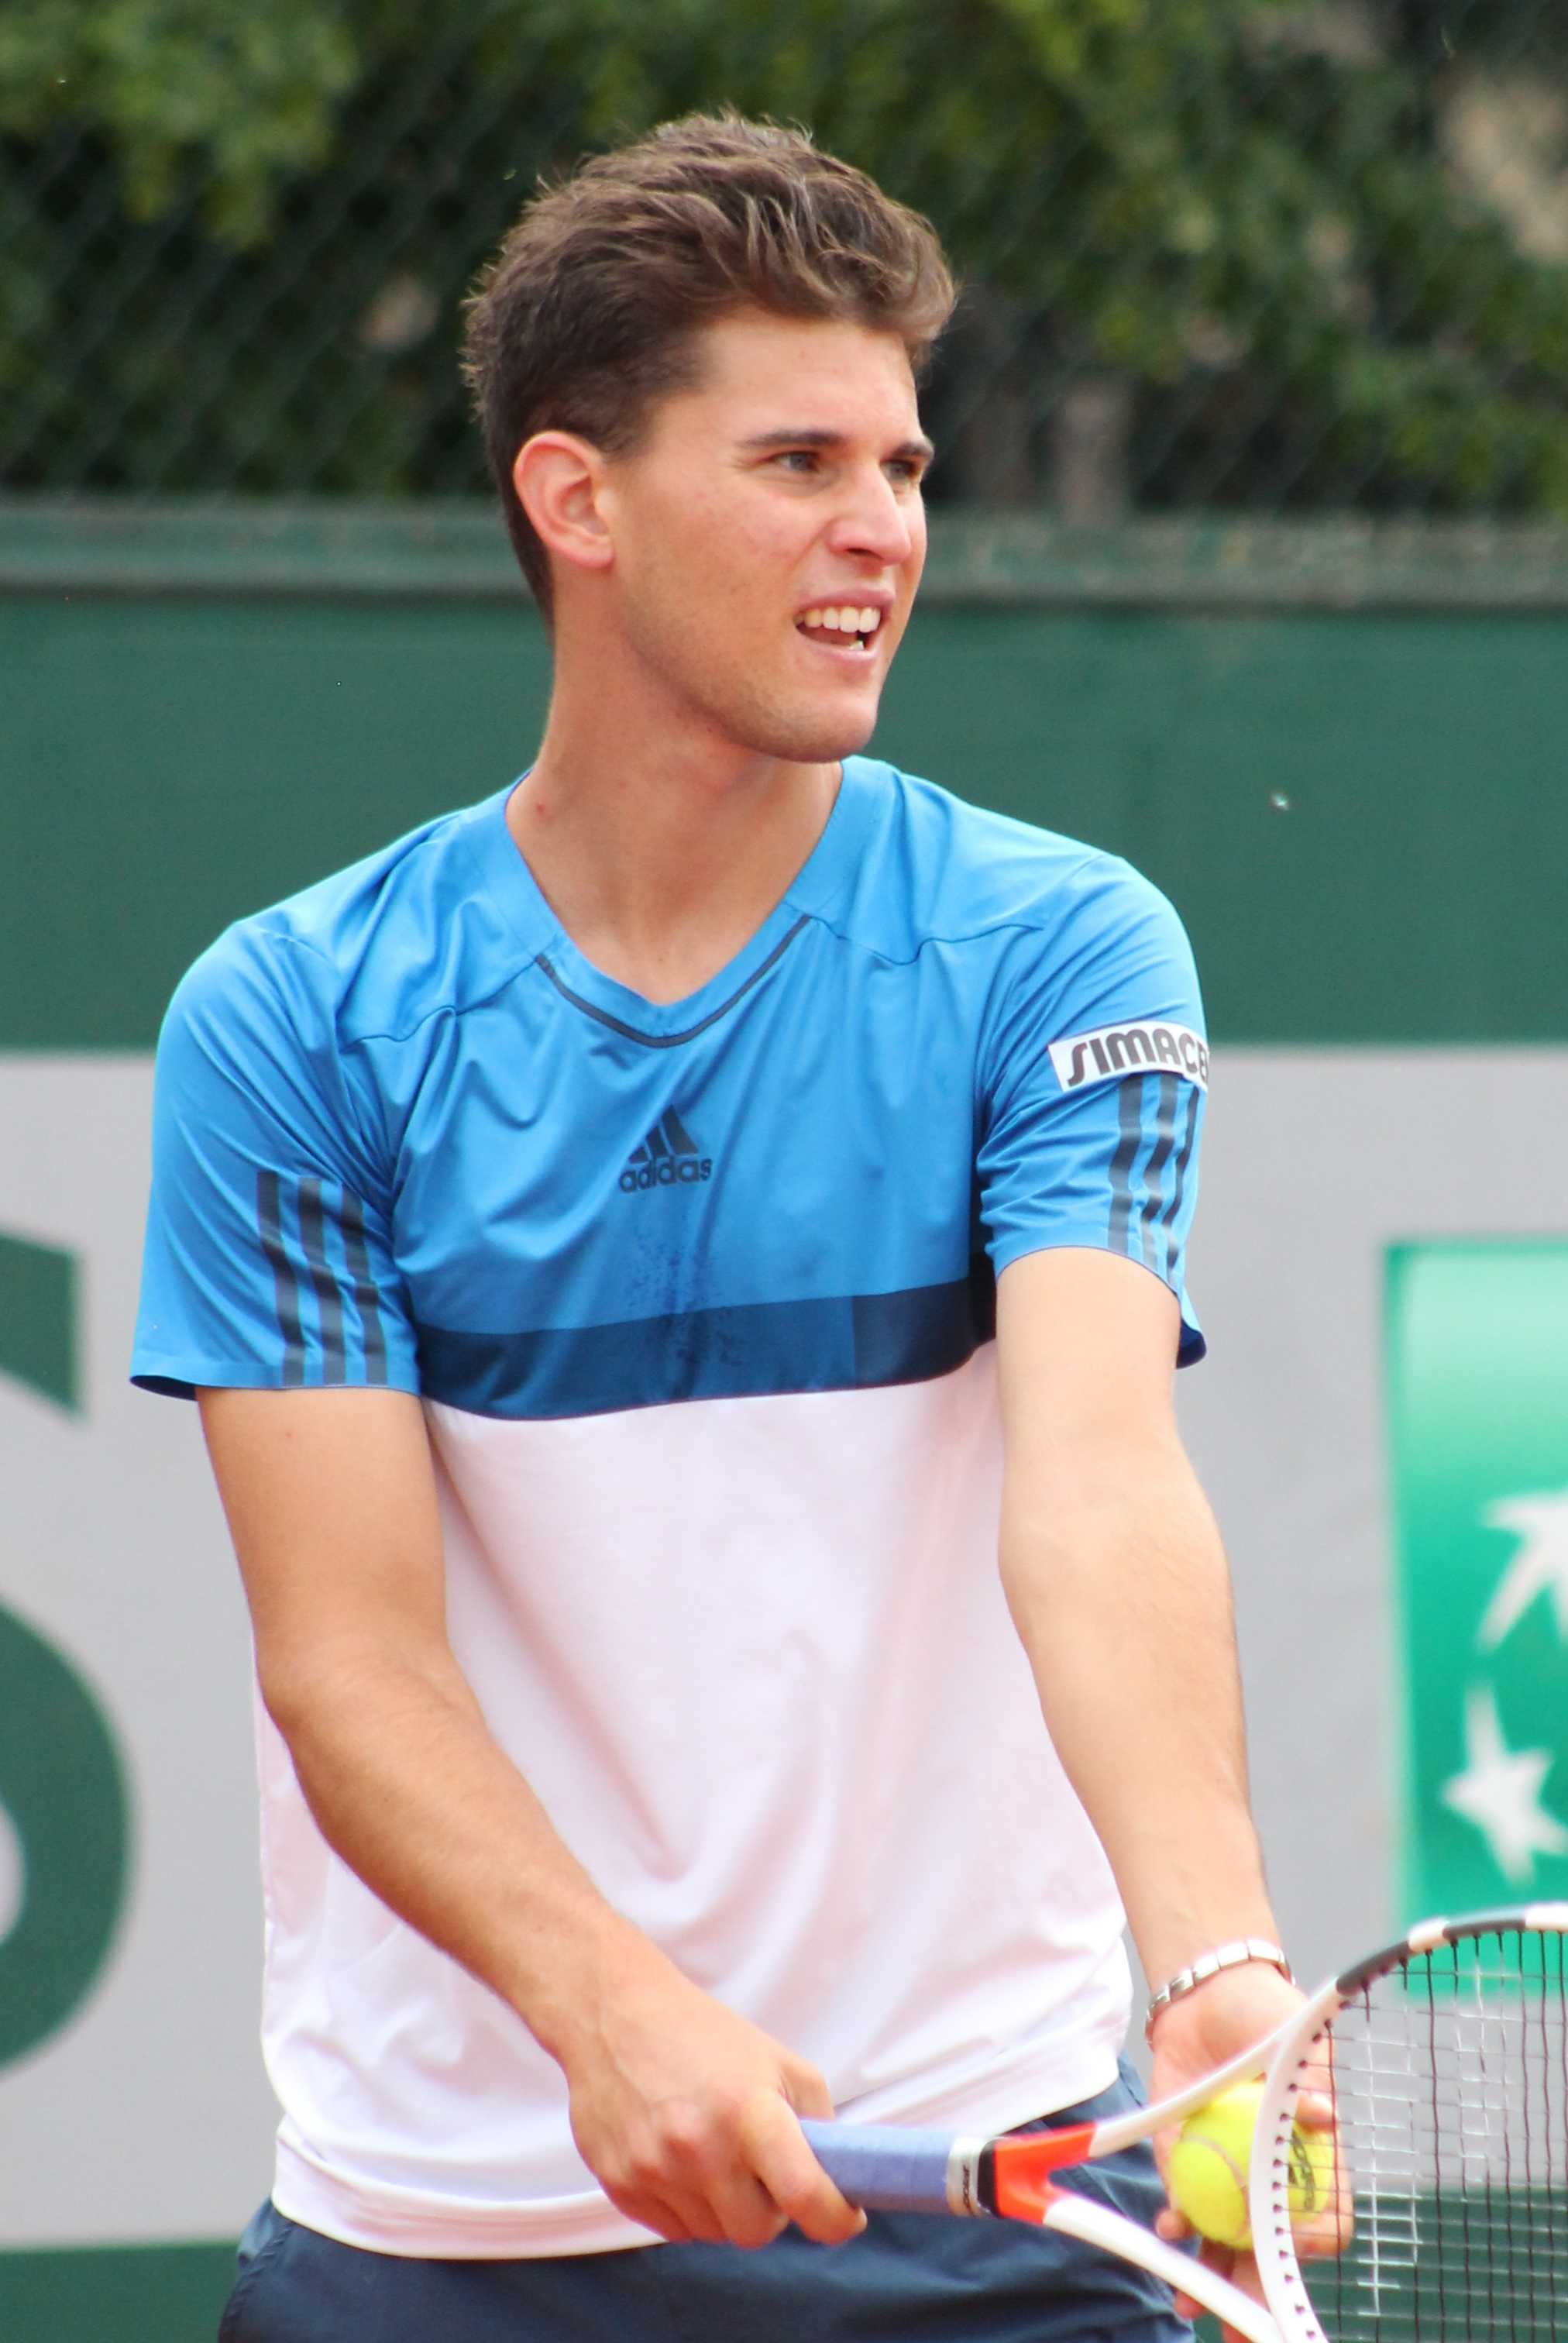 Tennisspieler Thiem